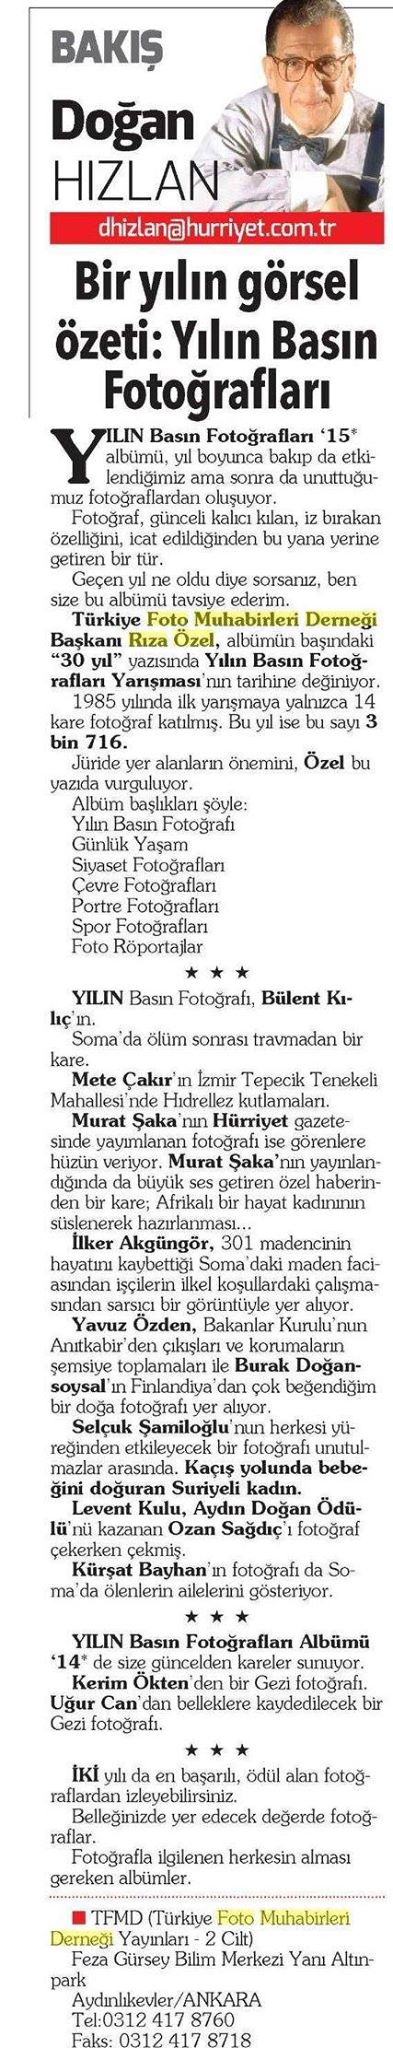 "Hürriyet Newspaper   November 3rd, 2015 | Dogan Hizlan, columnist   About my award winning ""Bear in the Mist"" photo"